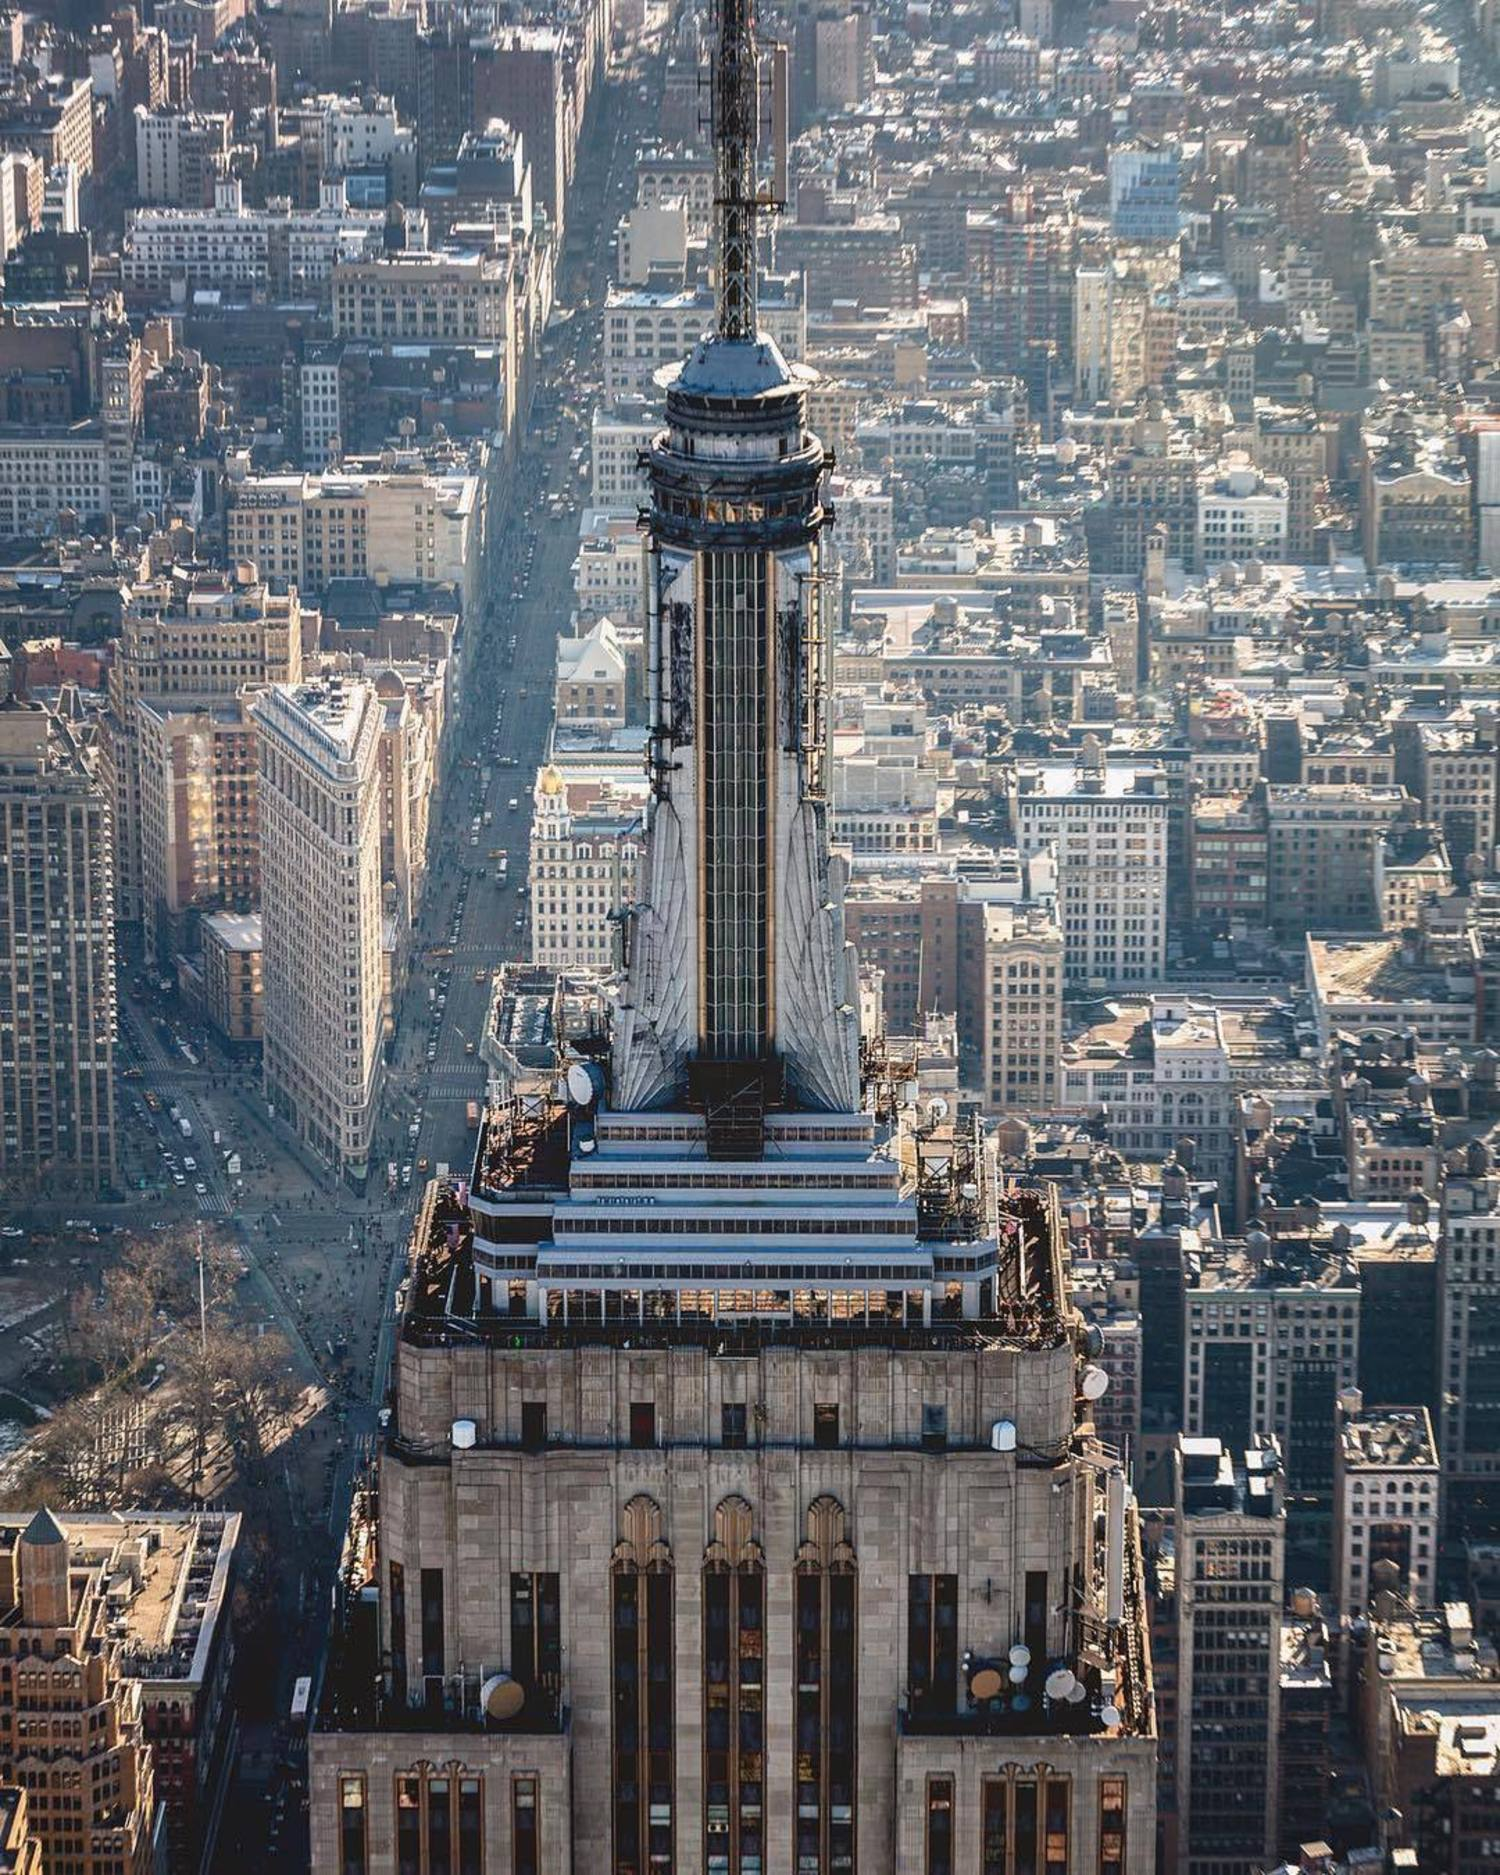 Empire State Building, Manhattan. Photo via @beholdingeye #viewingnyc #nyc #newyork #newyorkcity #empirestatebuilding